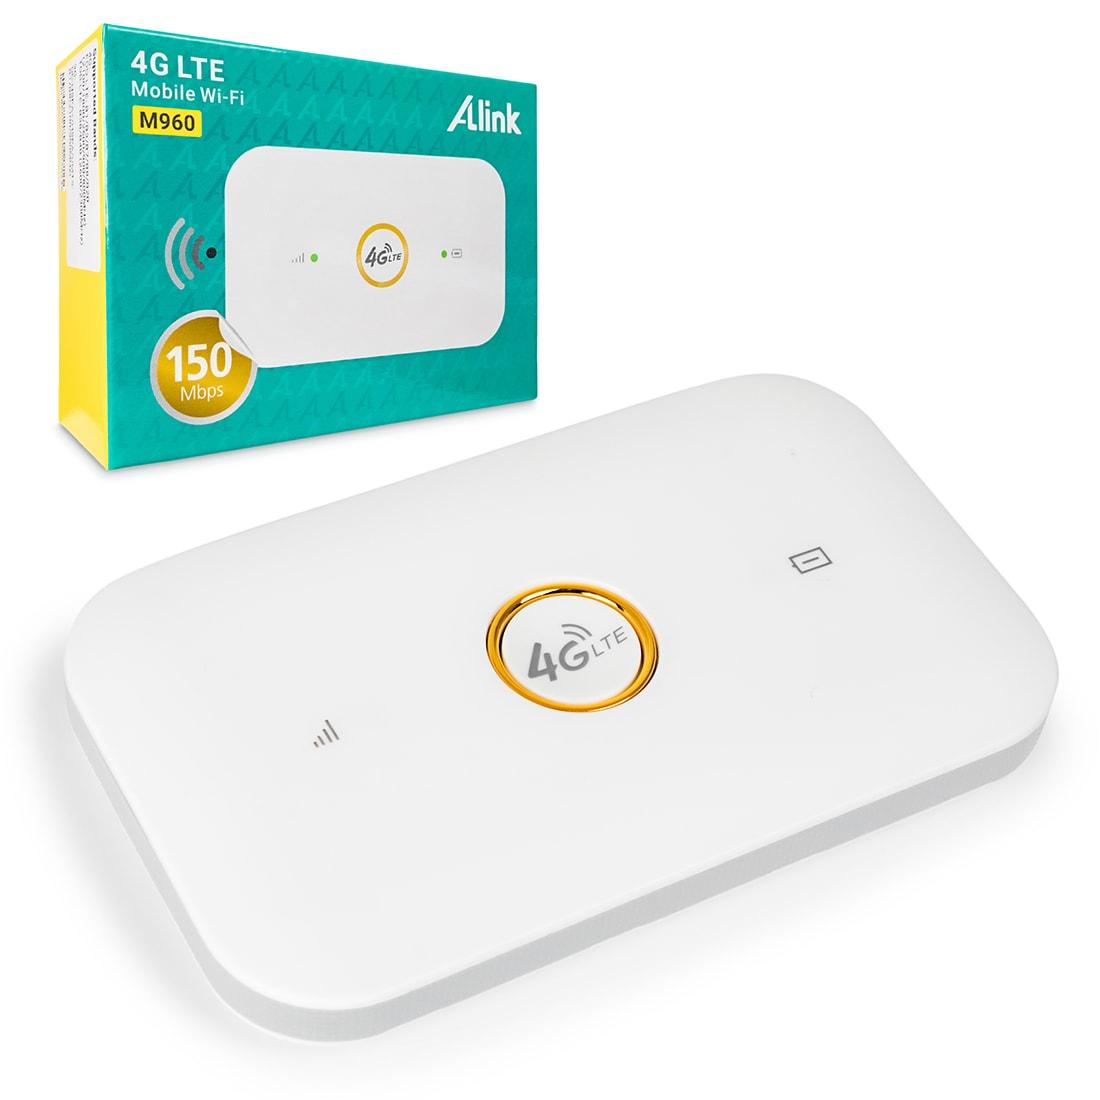 Router mobilny Alink M960 4G LTE 150Mbps SIM - 1